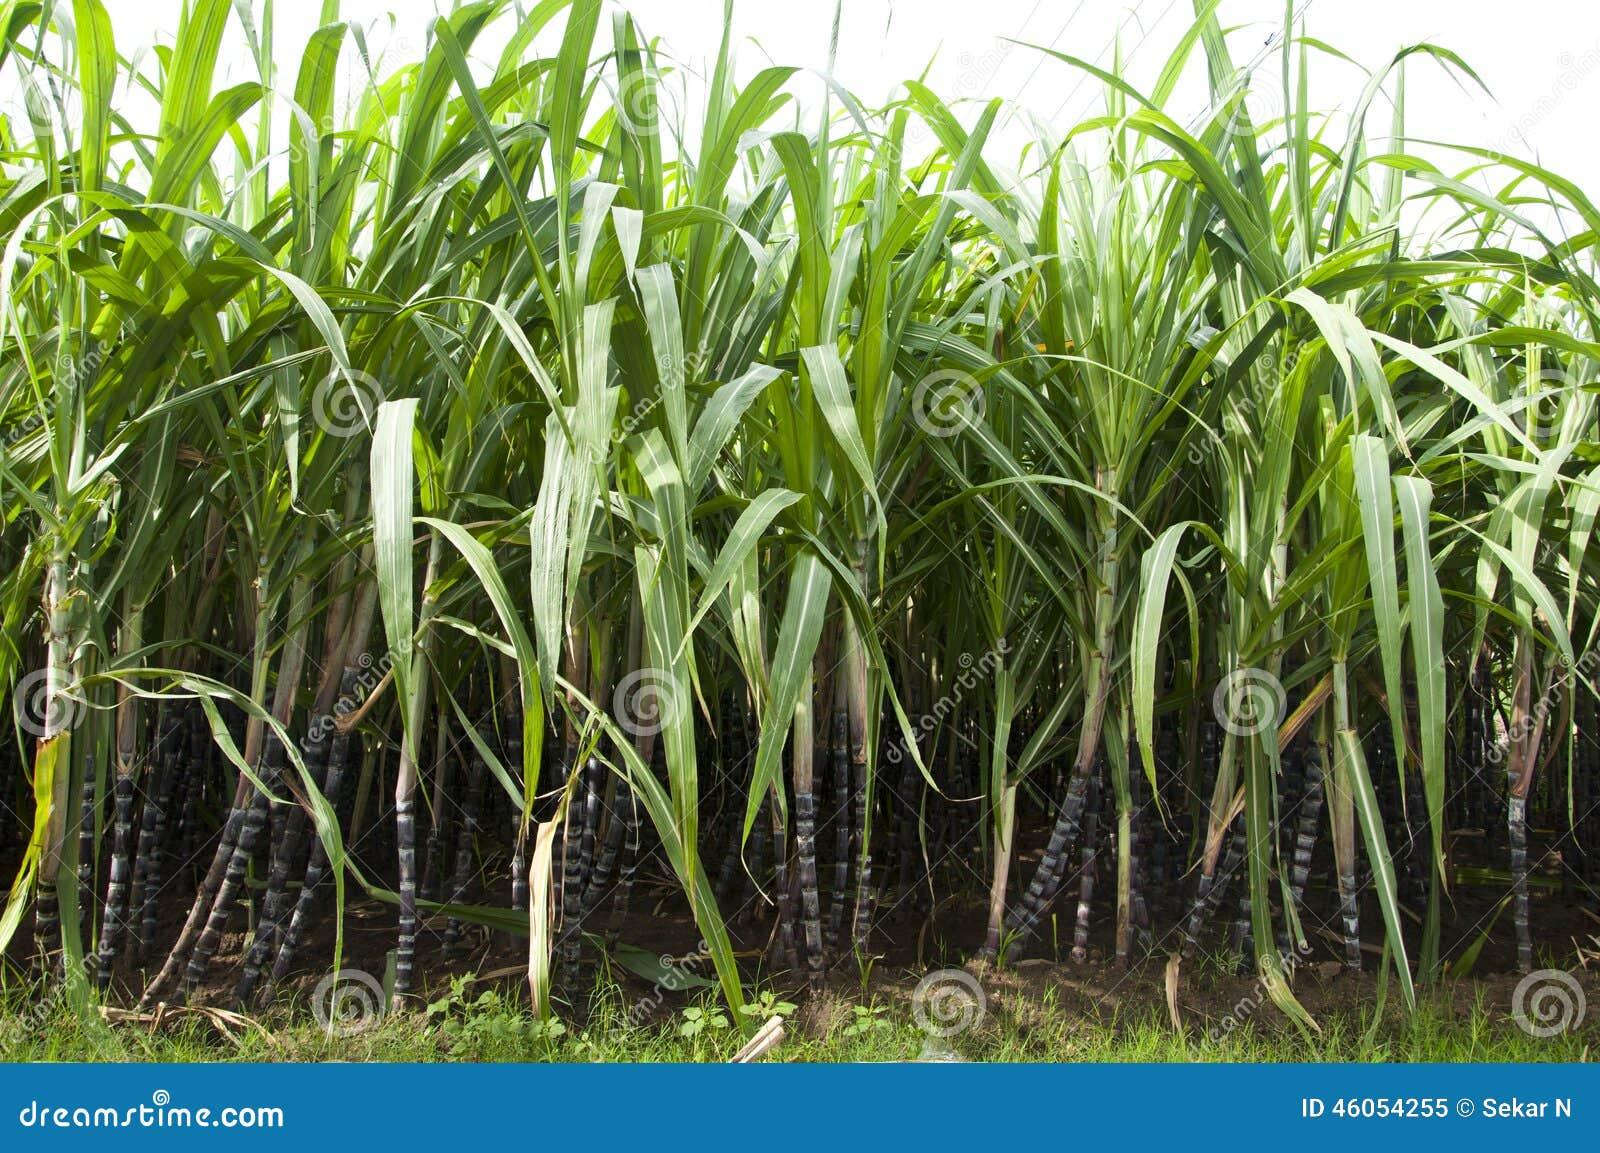 how to choose a sugar cane